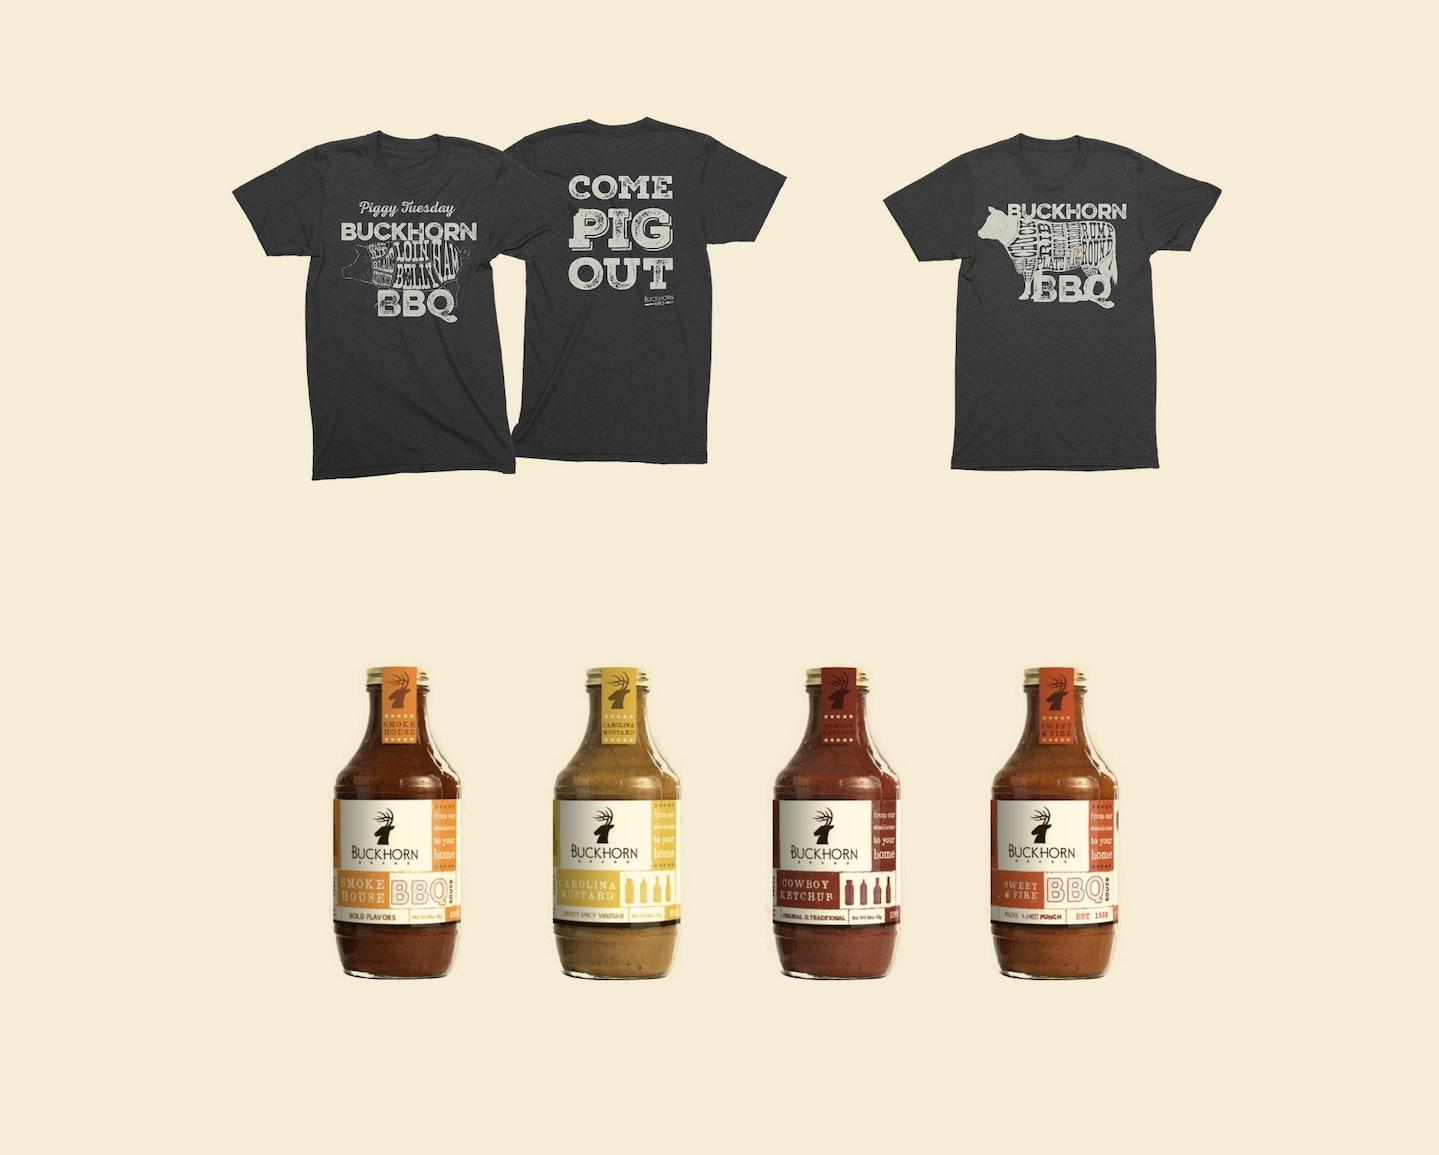 sacrametno retail design food packaging bbq suace store tshirt